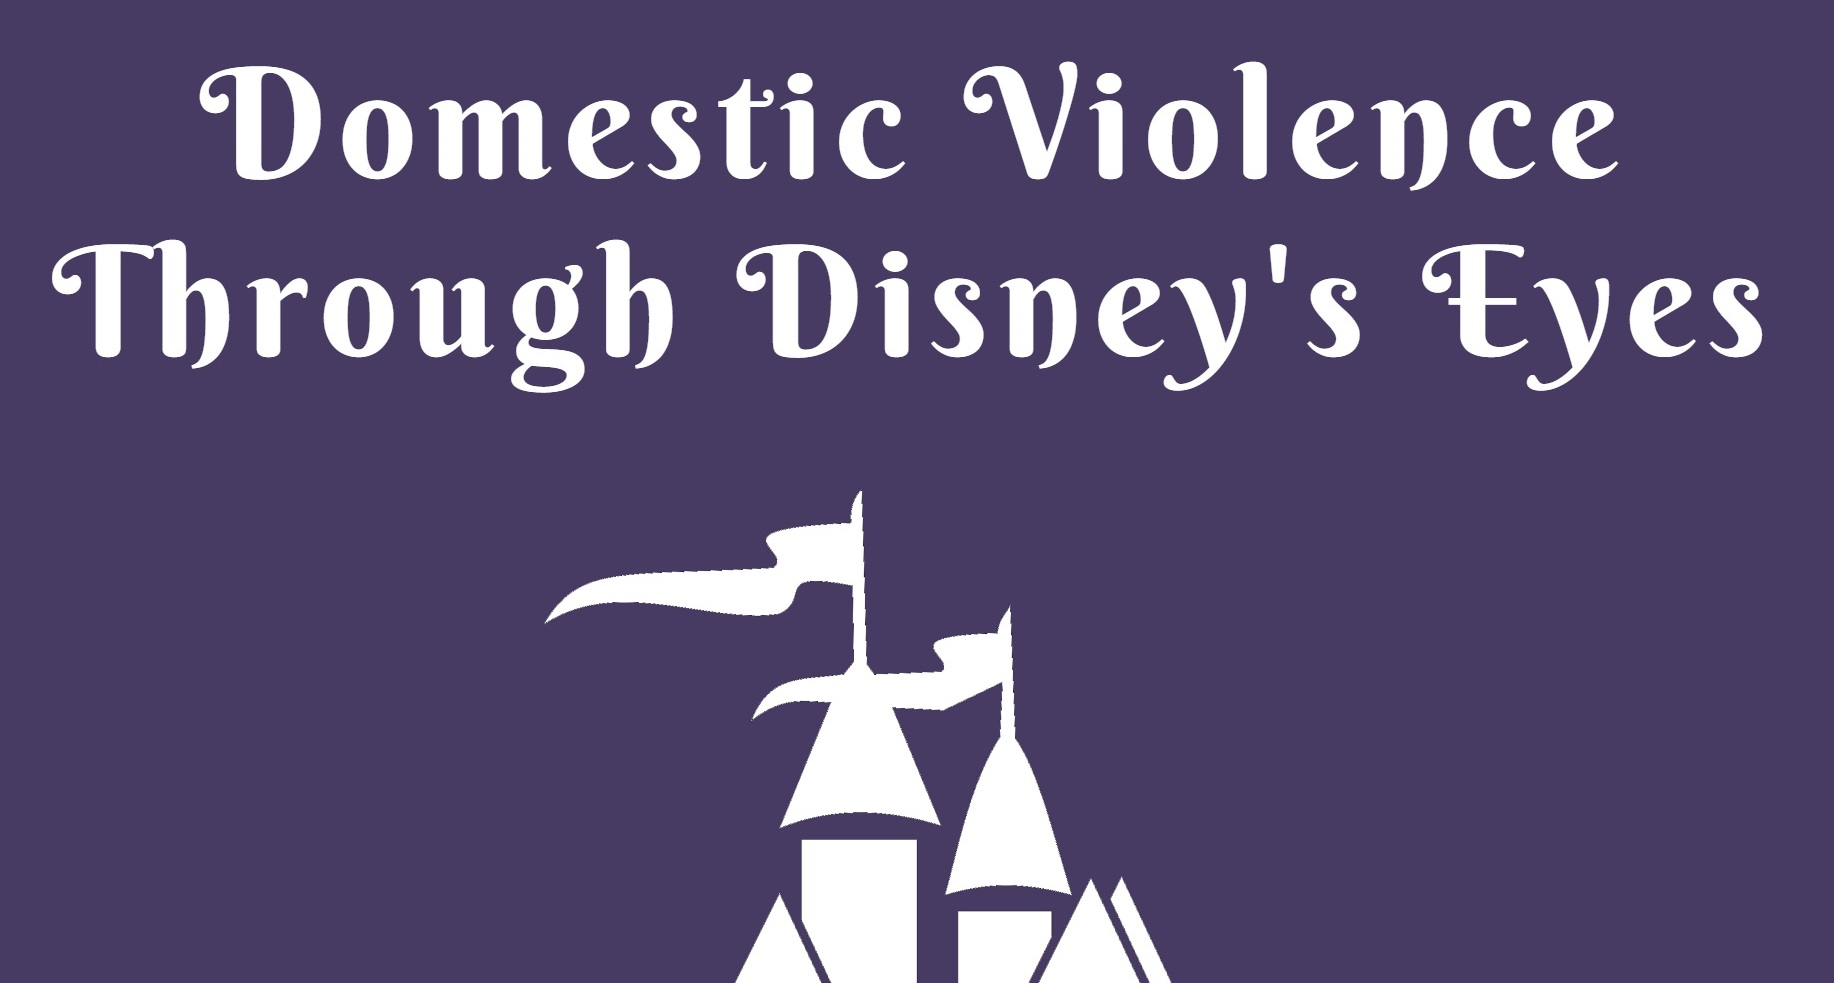 Domestic Violence Through Disney's Eyes